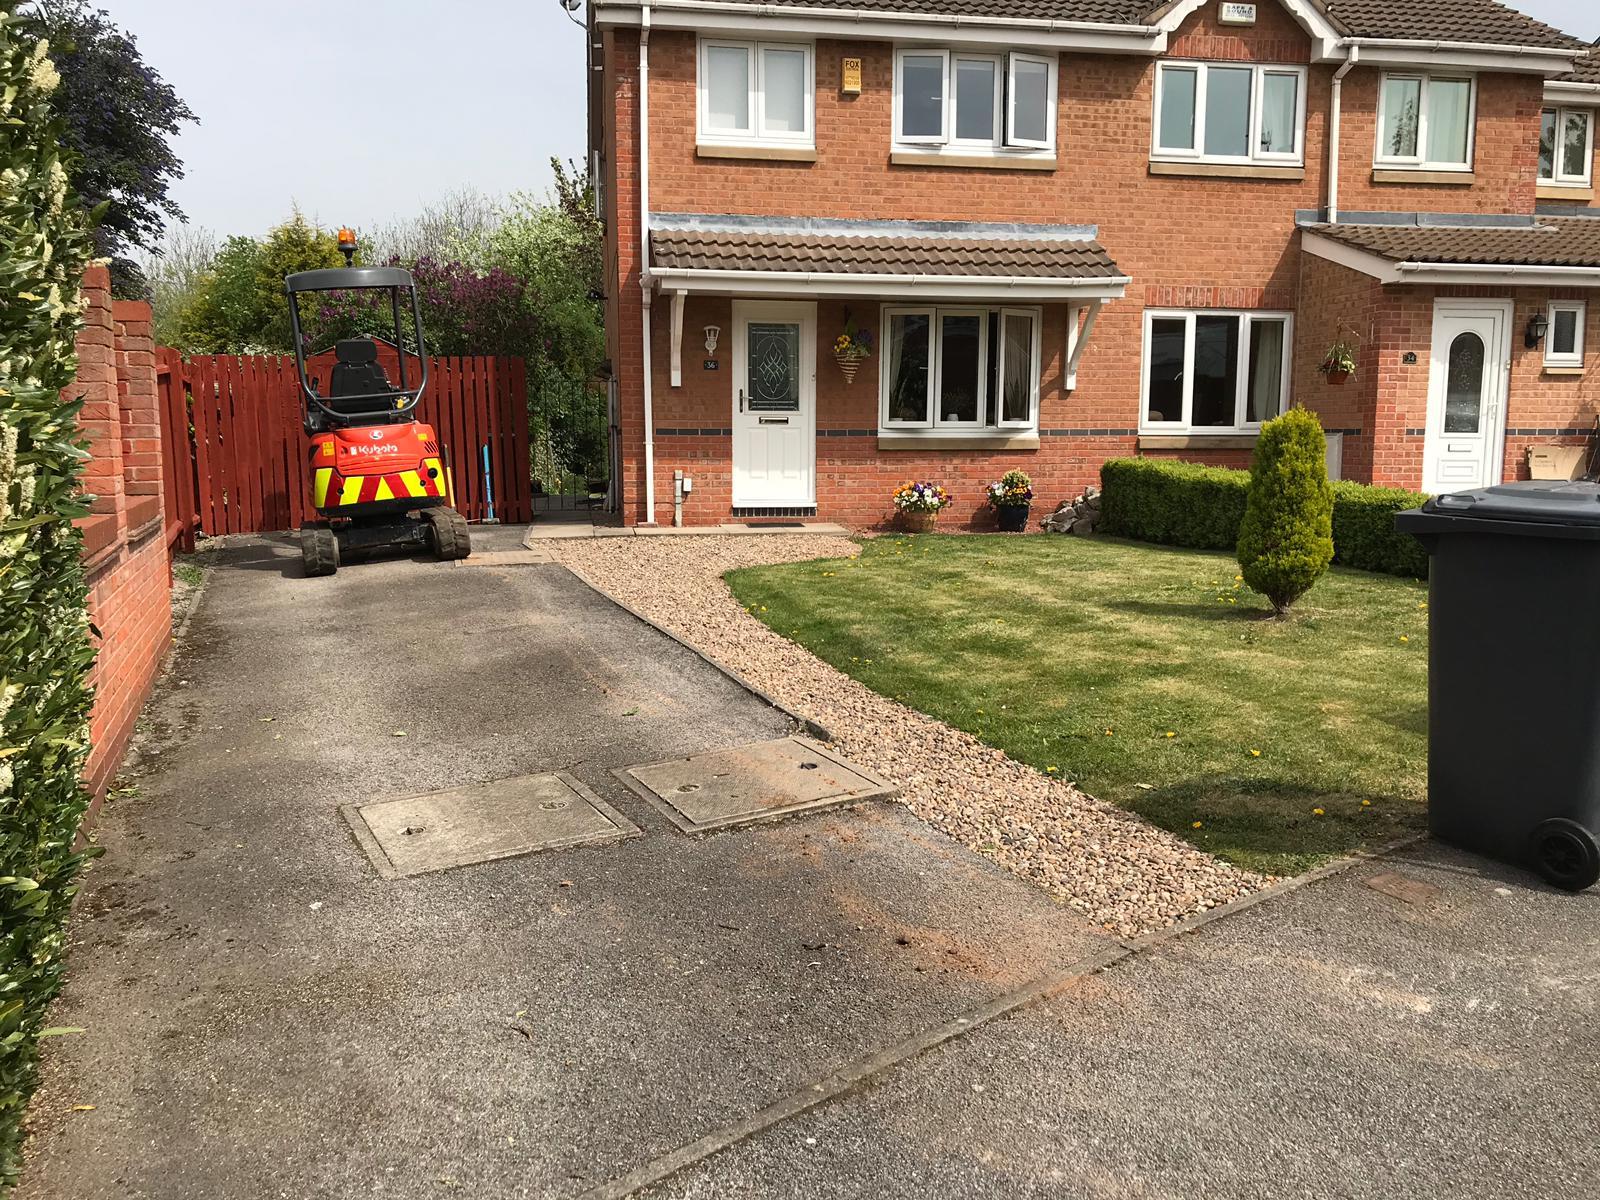 oakfield-drives-nottingham-driveway10-1 (1)